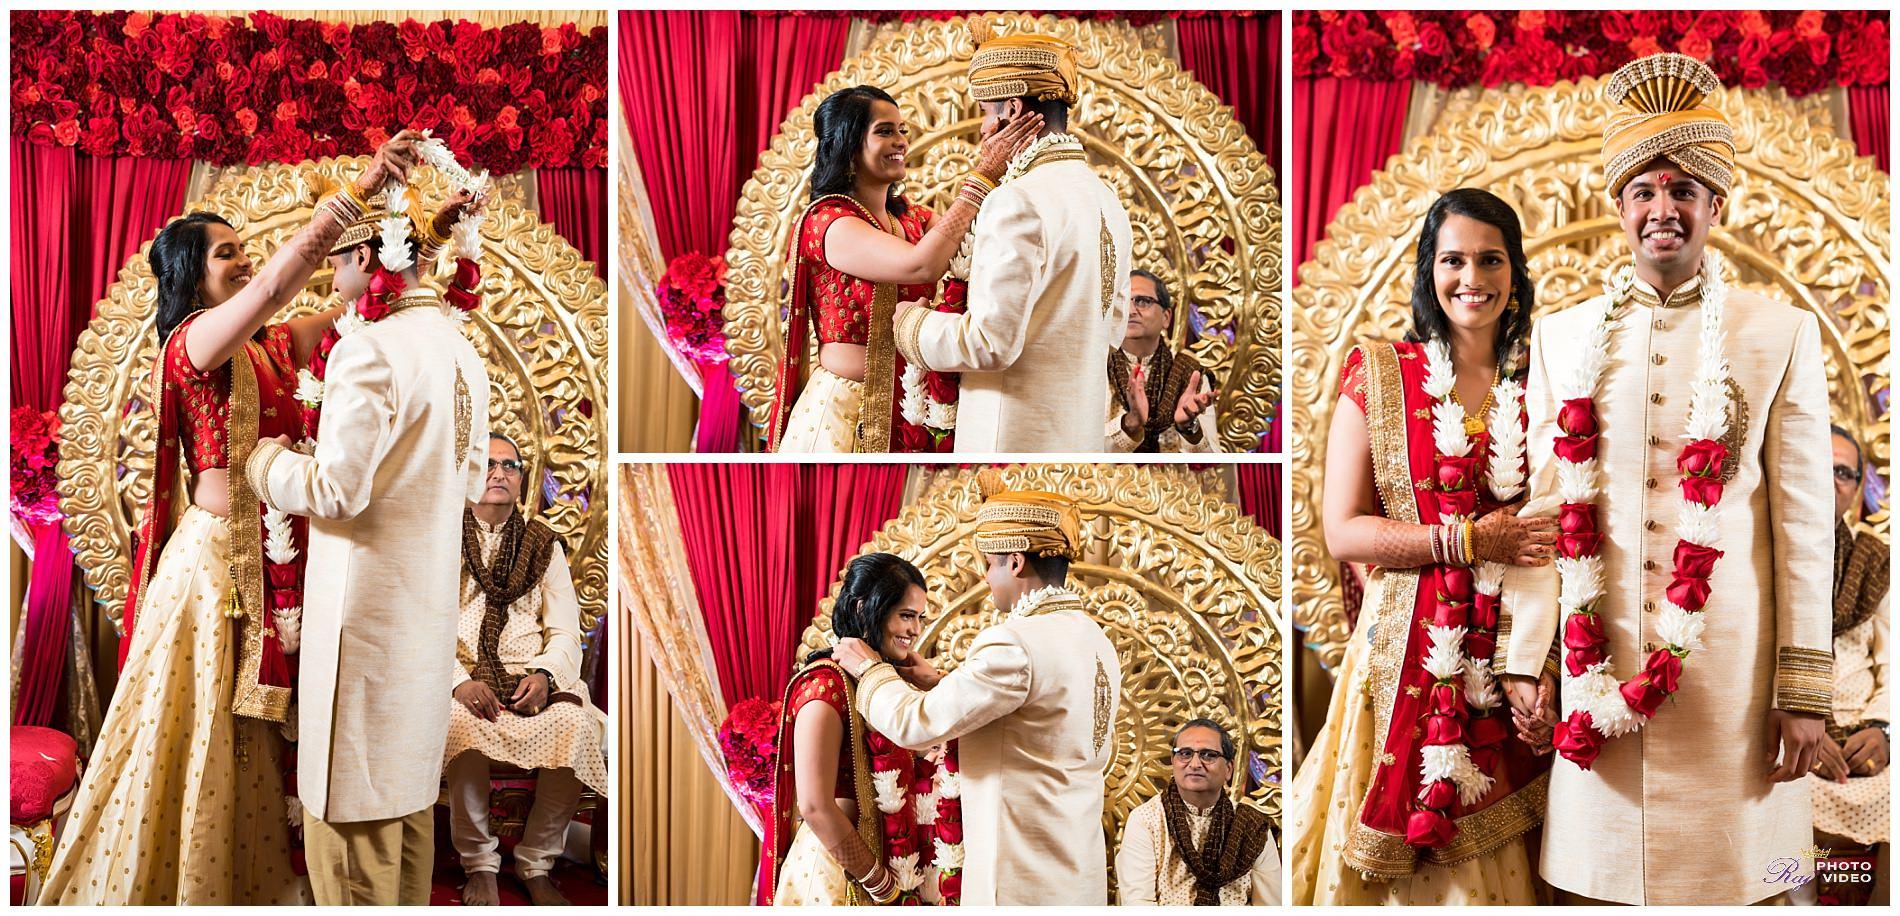 Martinsville-Gardens-NJ-Indian-Wedding-Ruchi-Vishal-25.jpg